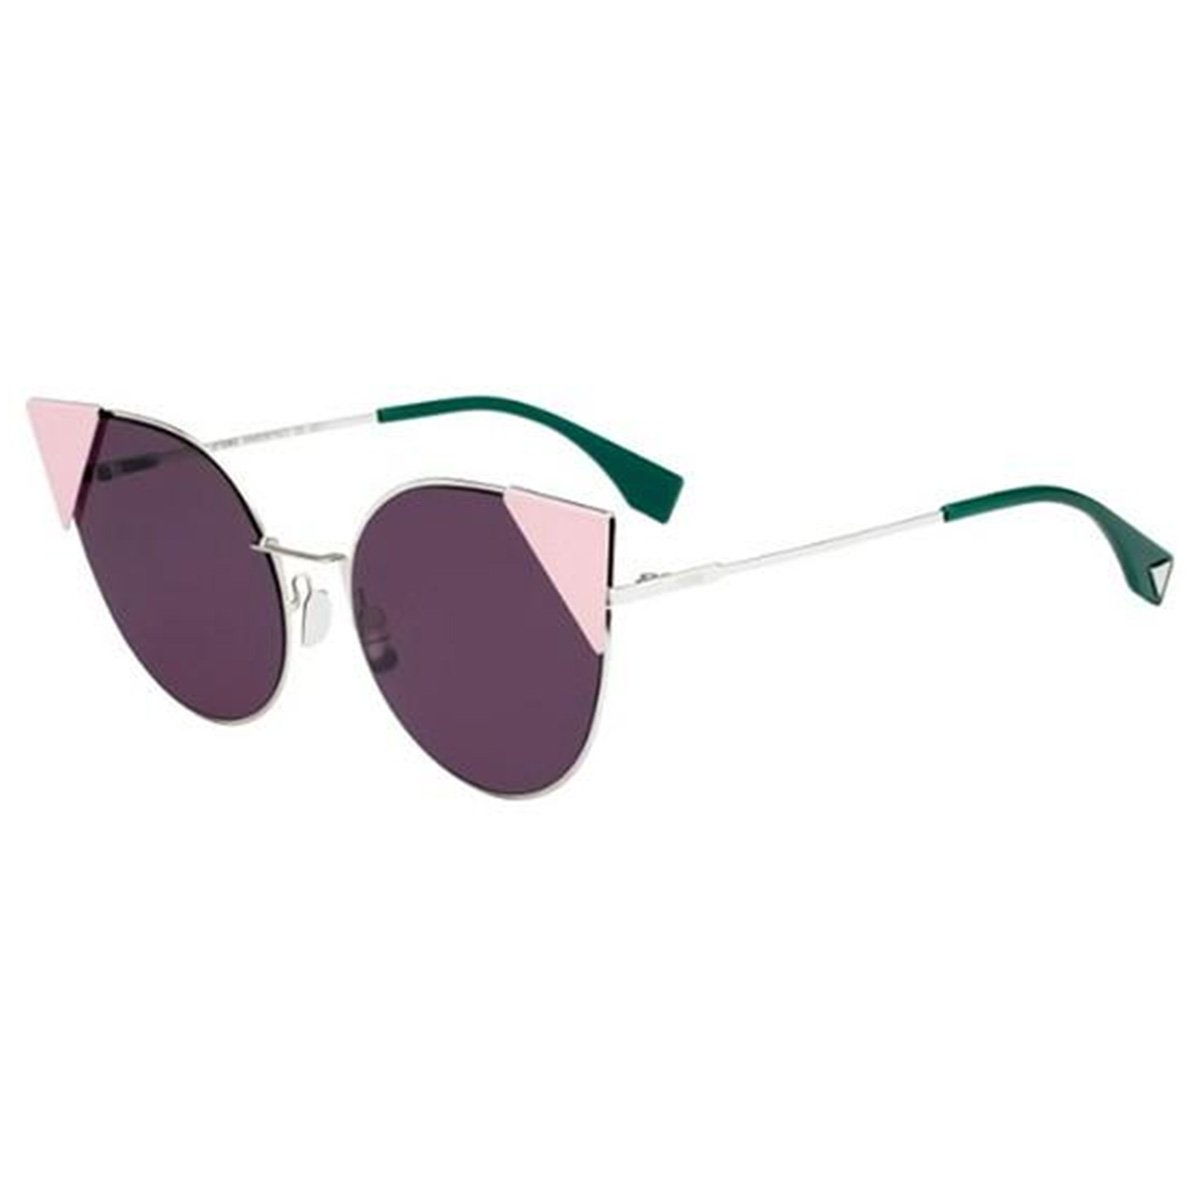 f5524358f5e2a Compre Óculos de Sol Fendi Lei em 10X   Tri-Jóia Shop